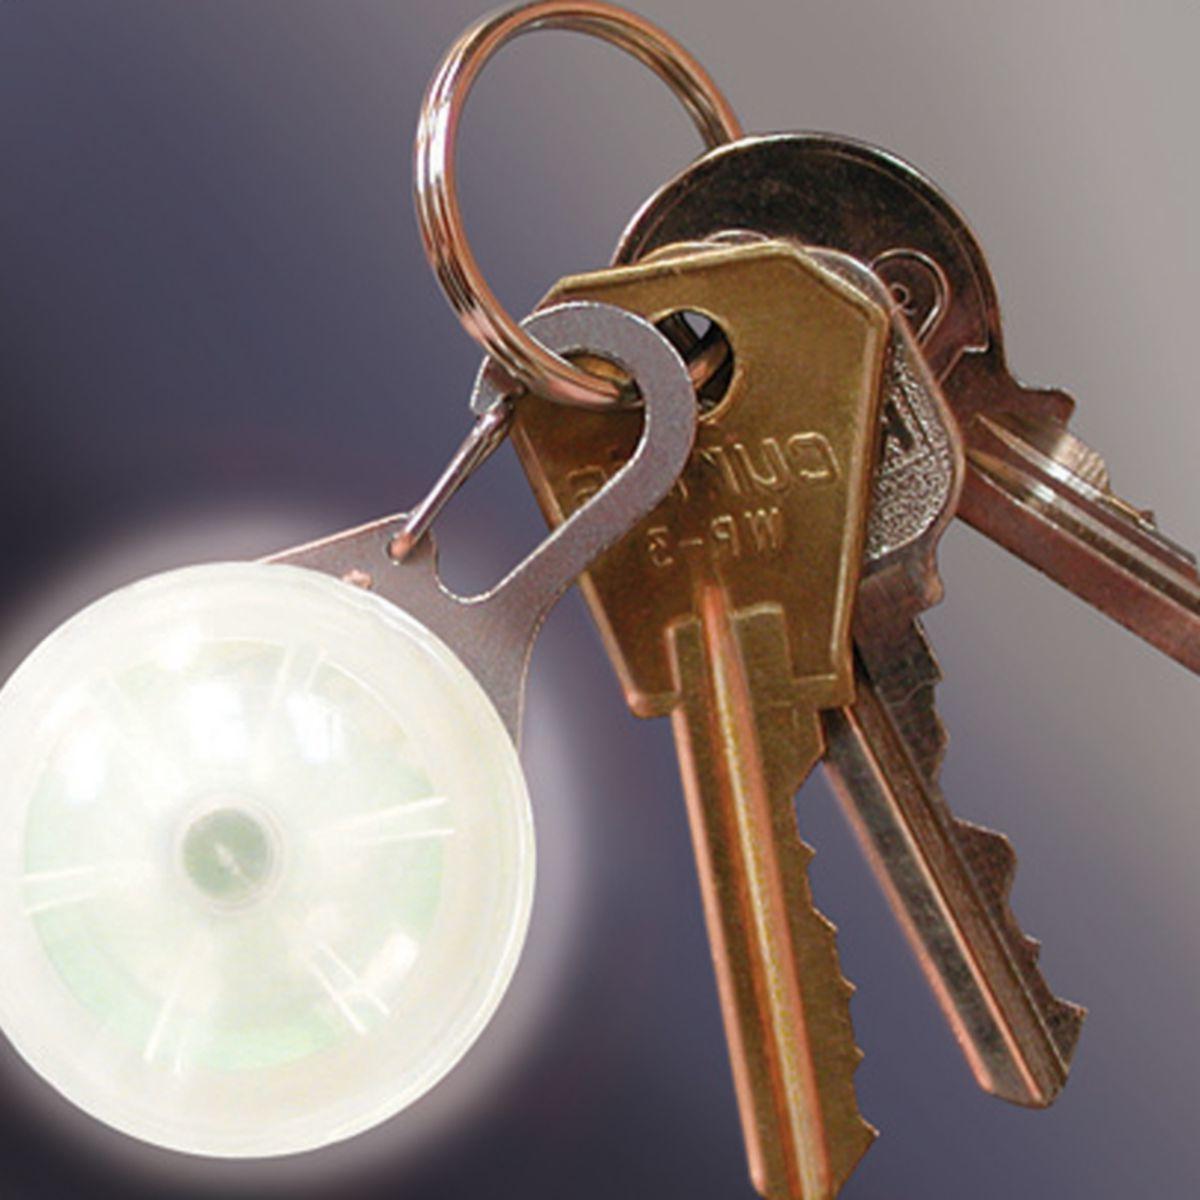 Nite Ize® SpotLit™ LED Carabiner Light